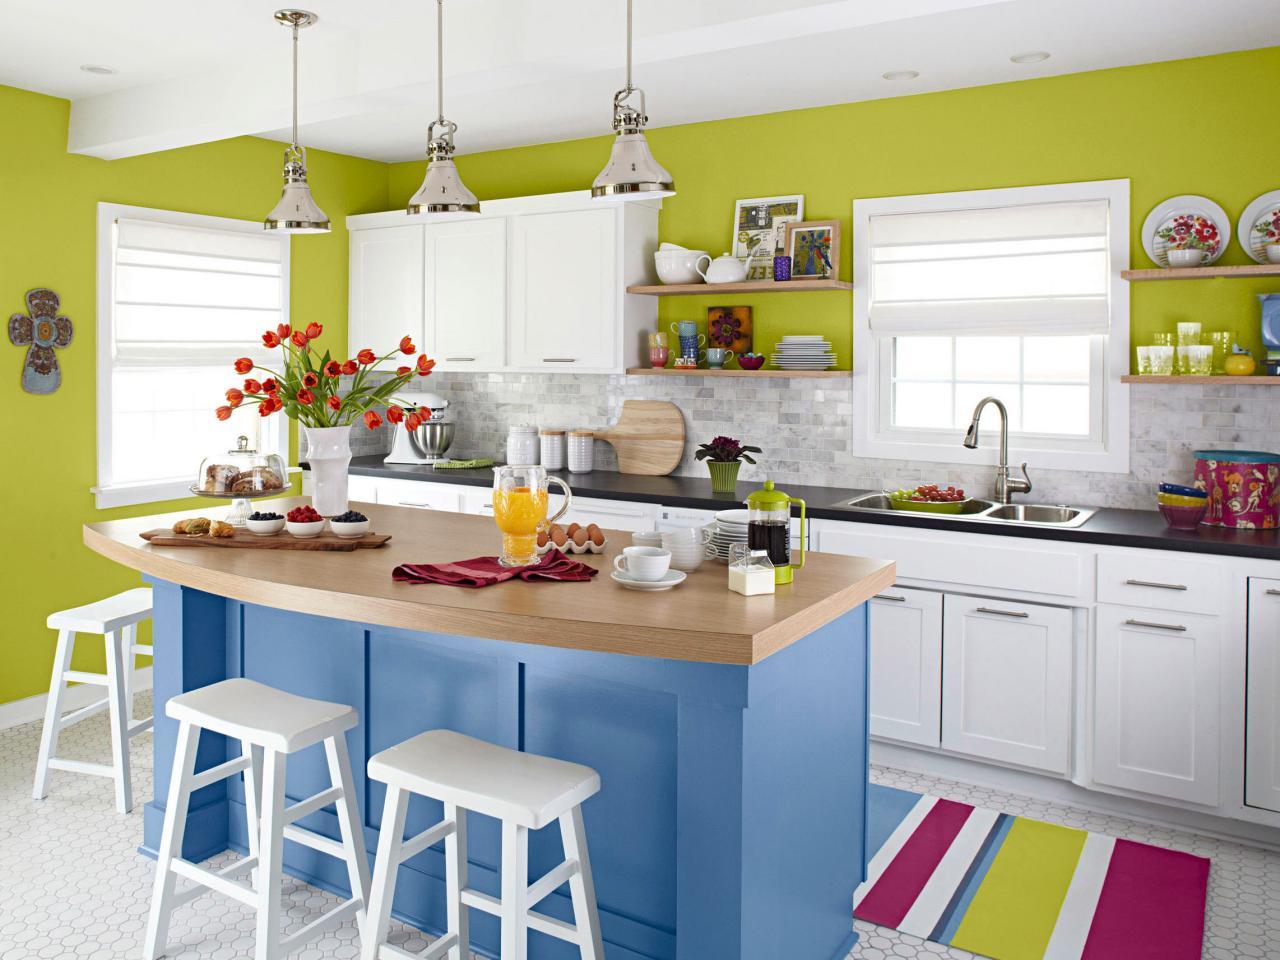 ci-lowes-kreative-ideer-lille-køkken-island_s4x3-jpg-rend-hgtvcom-1280-960